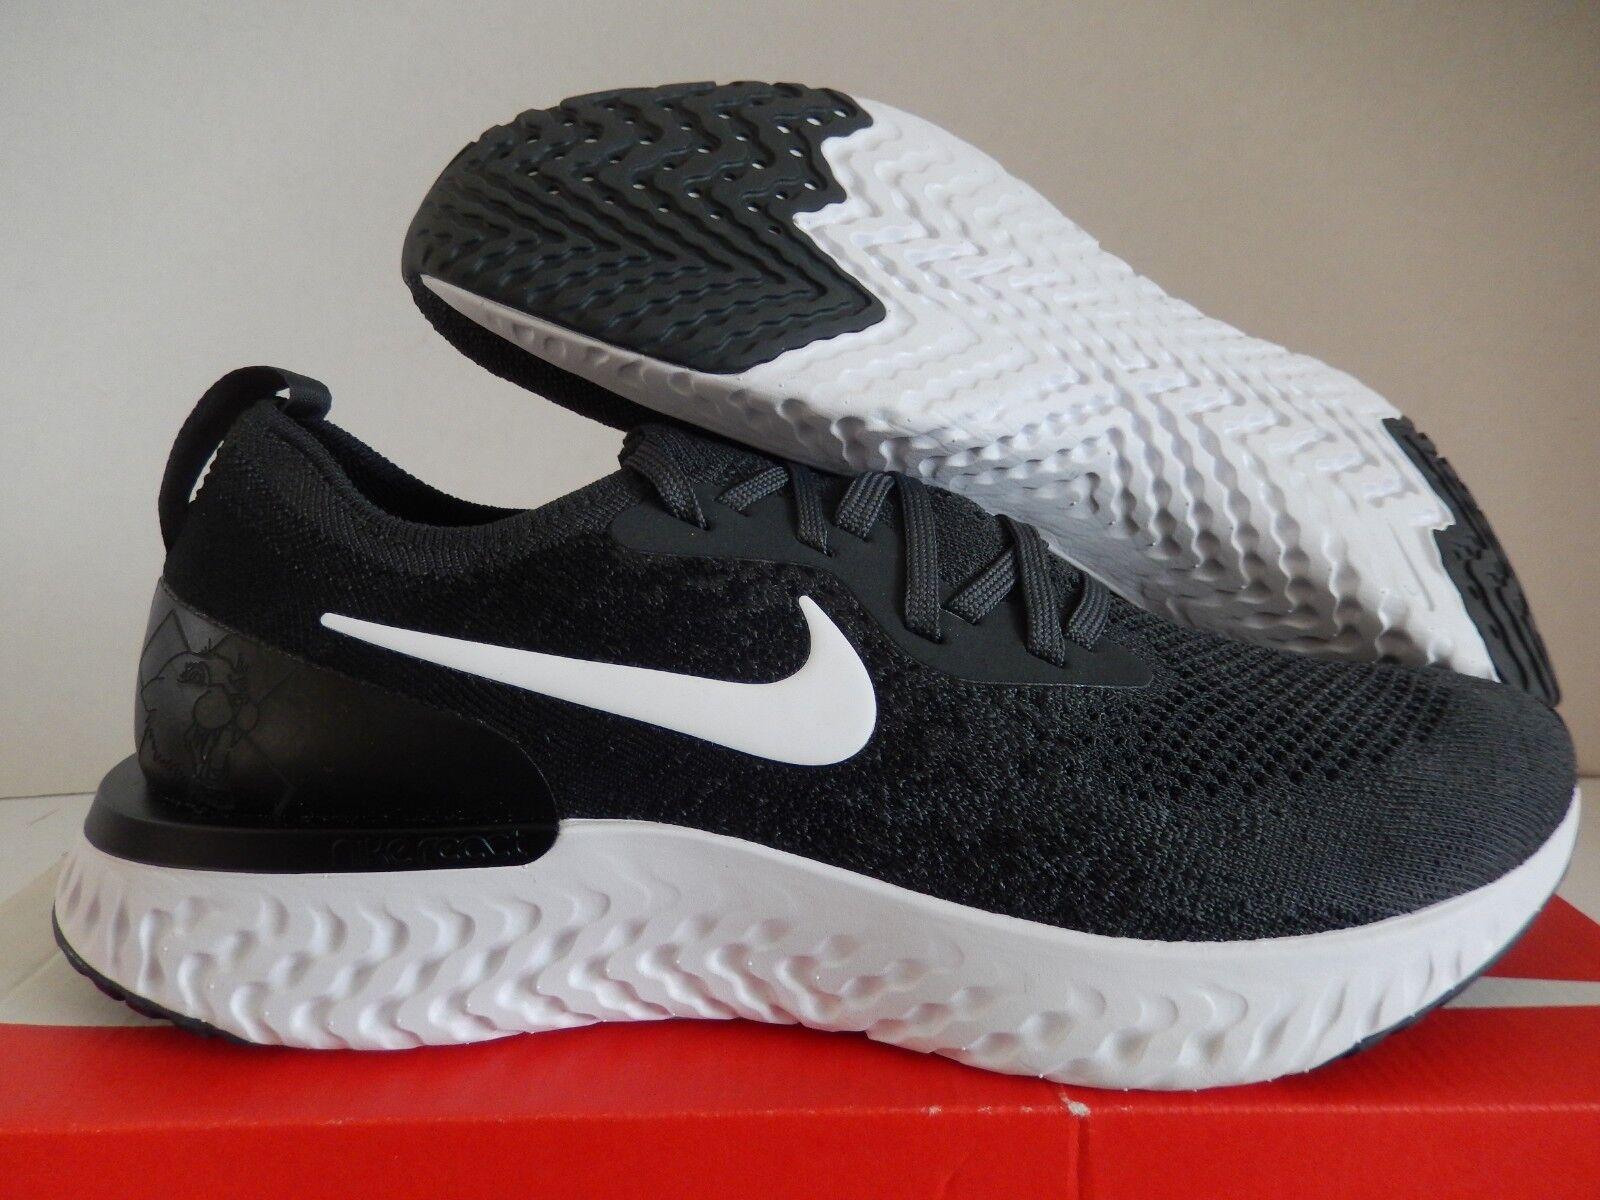 Nike Nike Nike epischen reagieren flyknit dunkle Grau-schwarz-Weiß sz - 9,5 (bv5968-994] 1a9c71